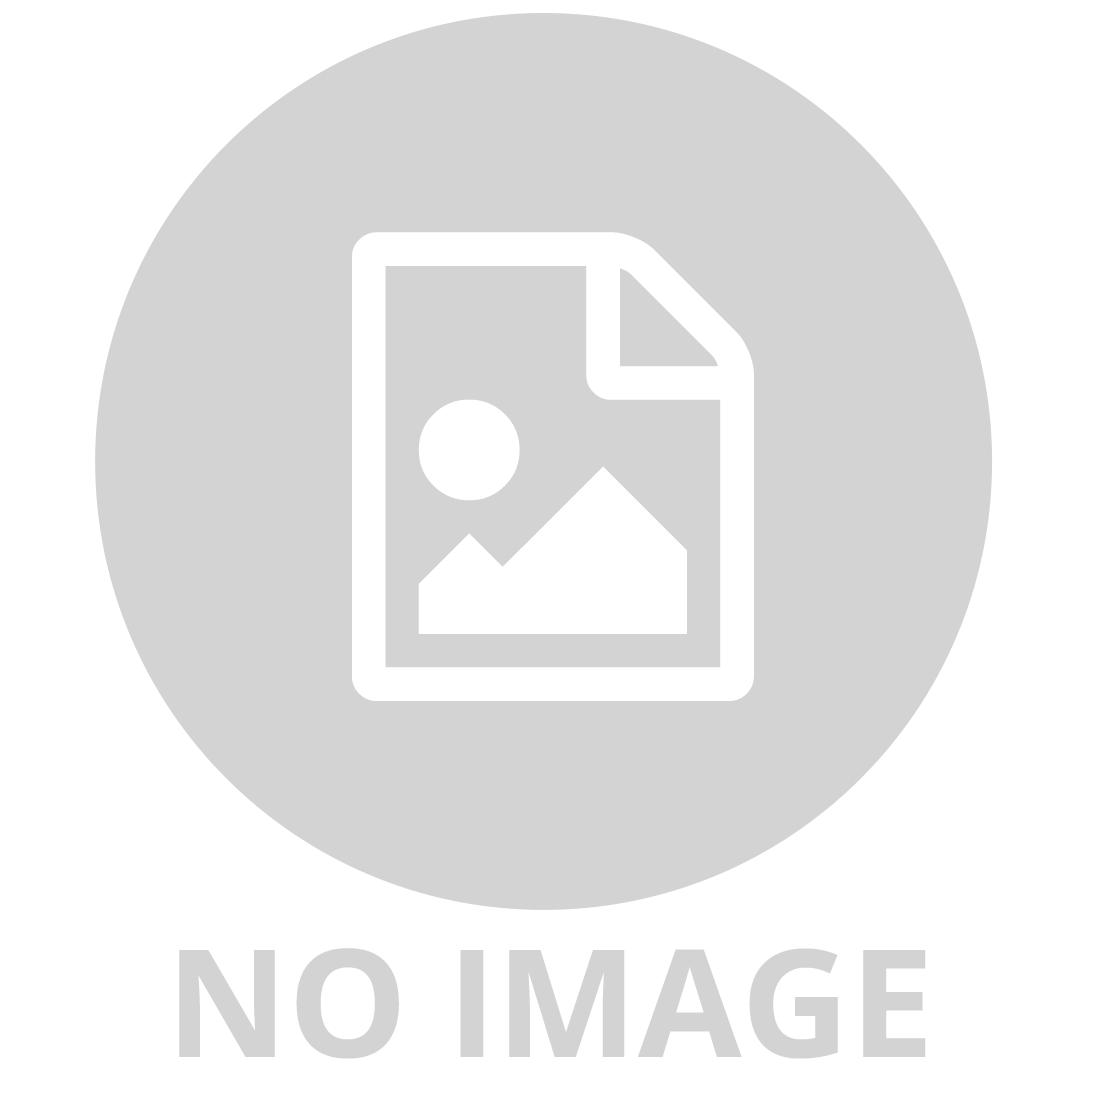 KINETIC SAND BEACH SAND NATURAL COLOUR 1.36kg